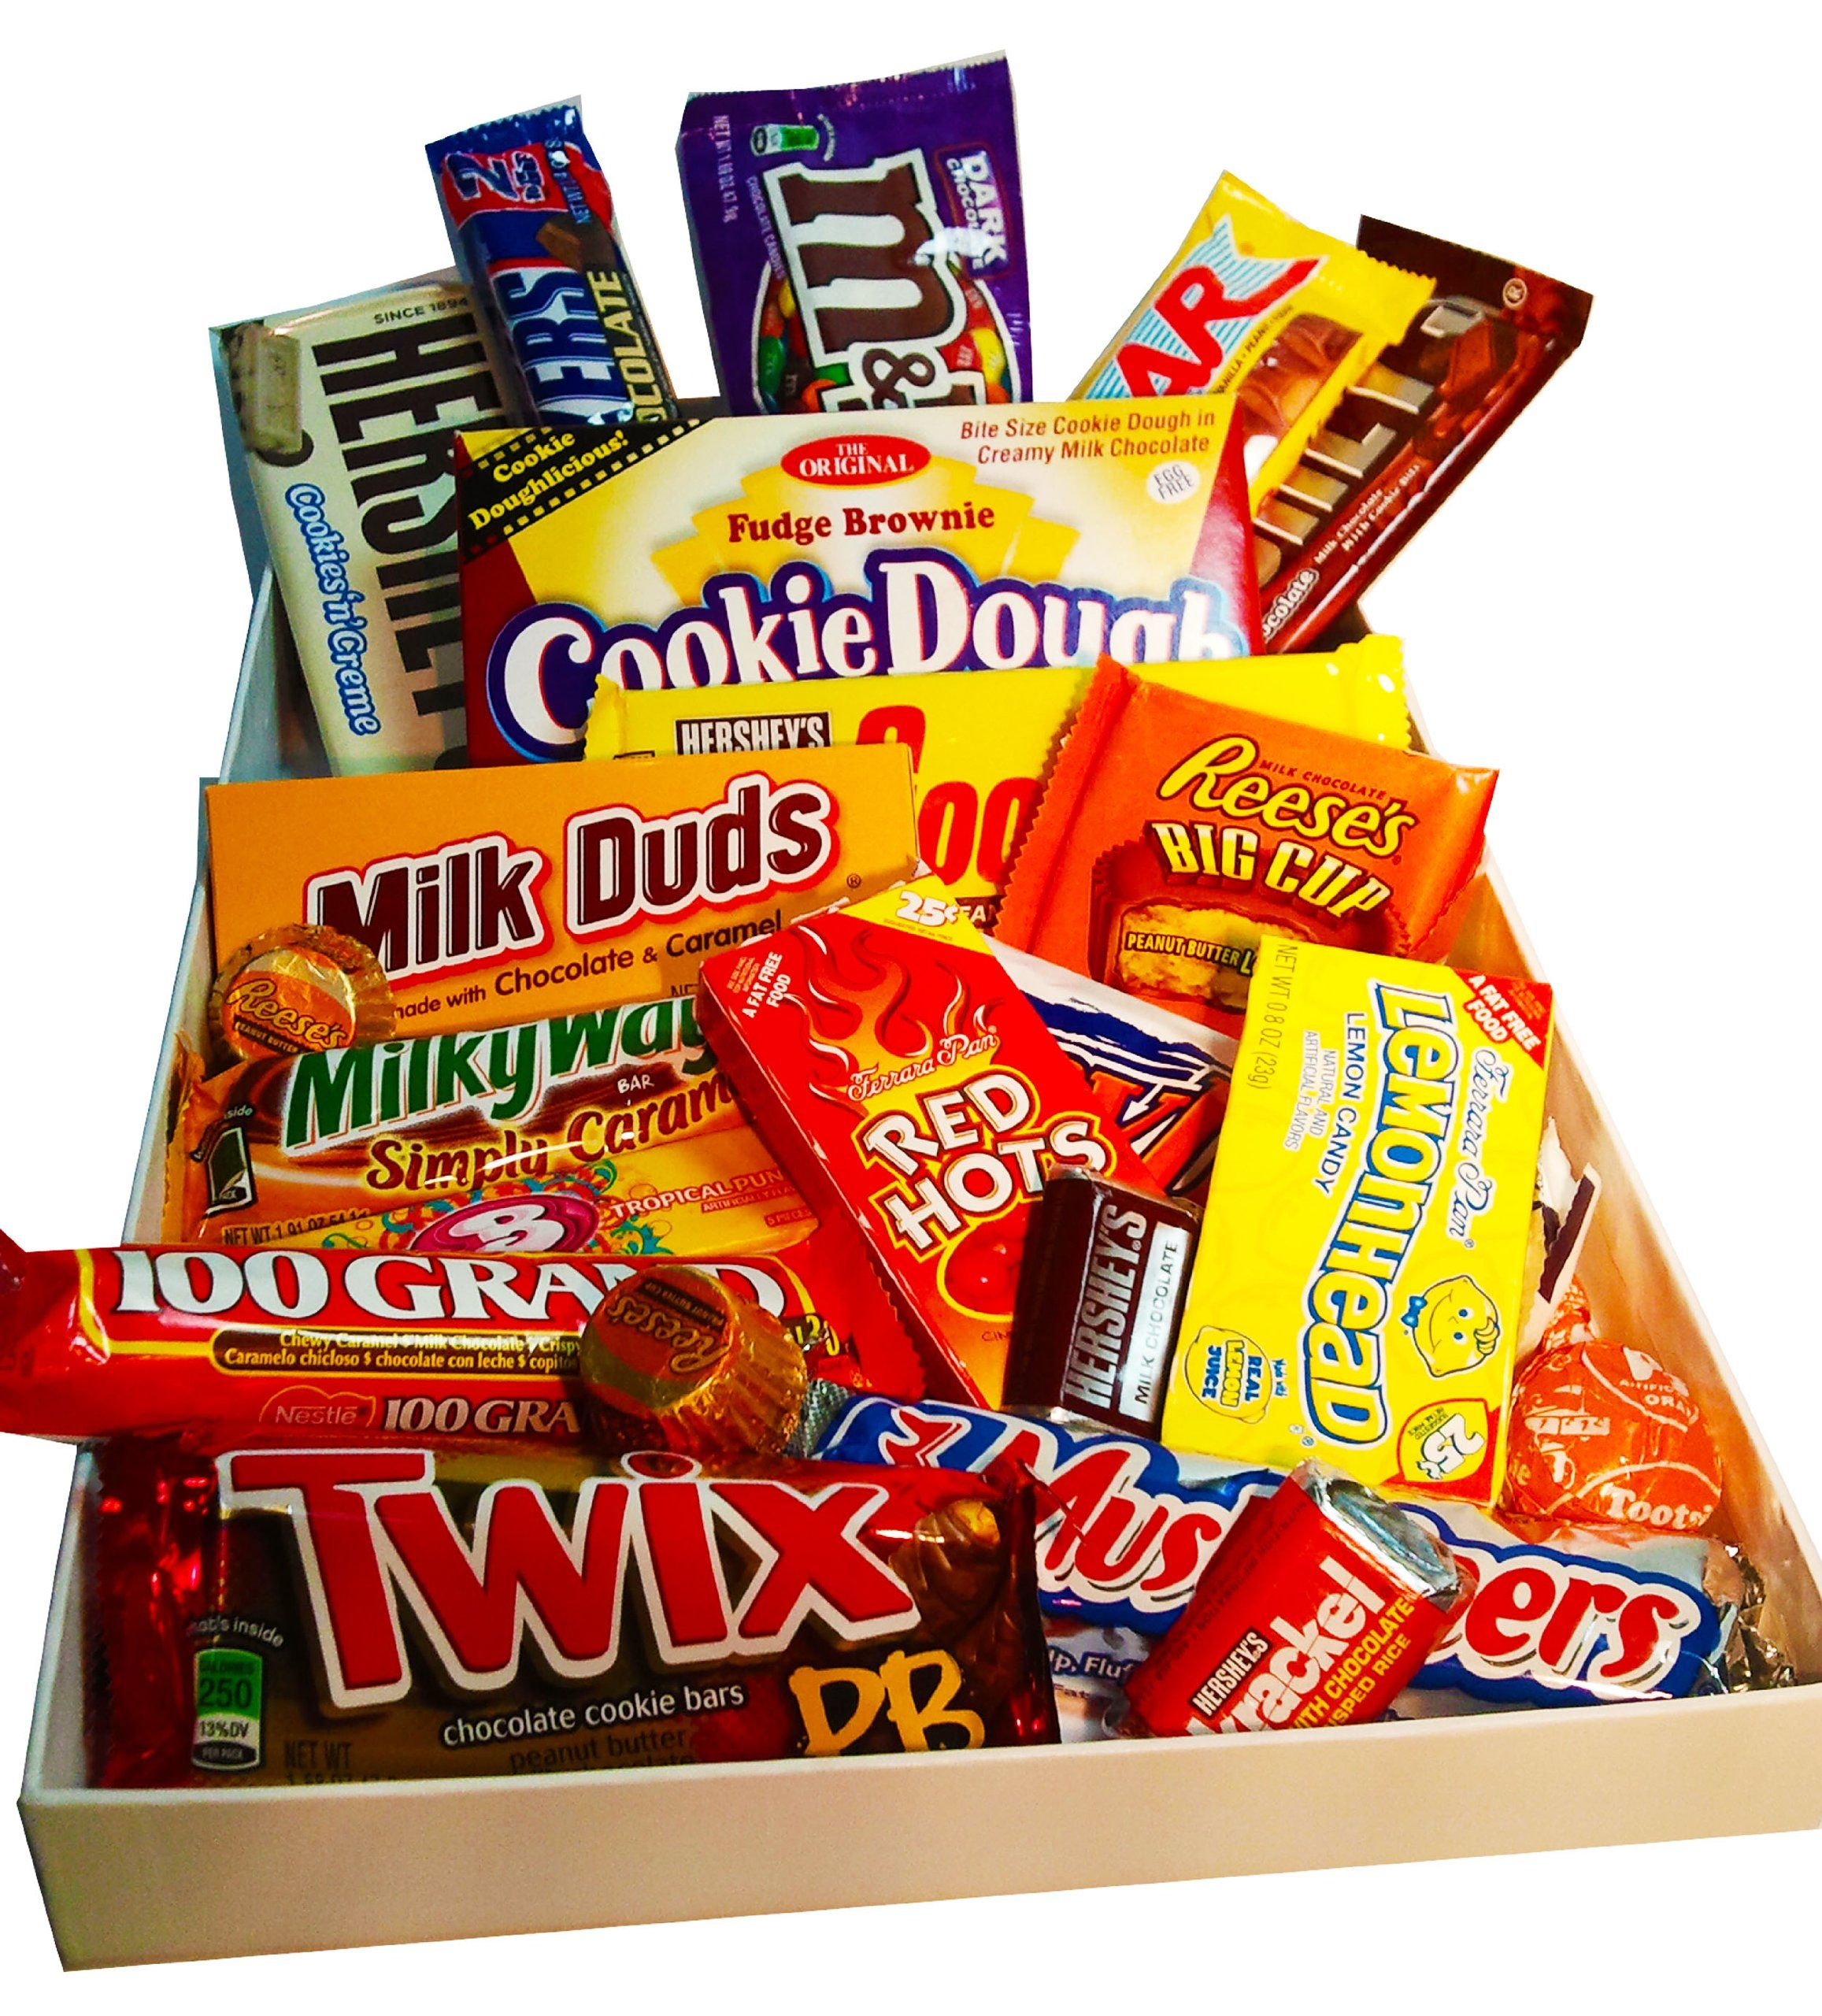 US CHOC CANDY MEGA BOX 05 DAISY DUKE'S AMERICAN CANDY